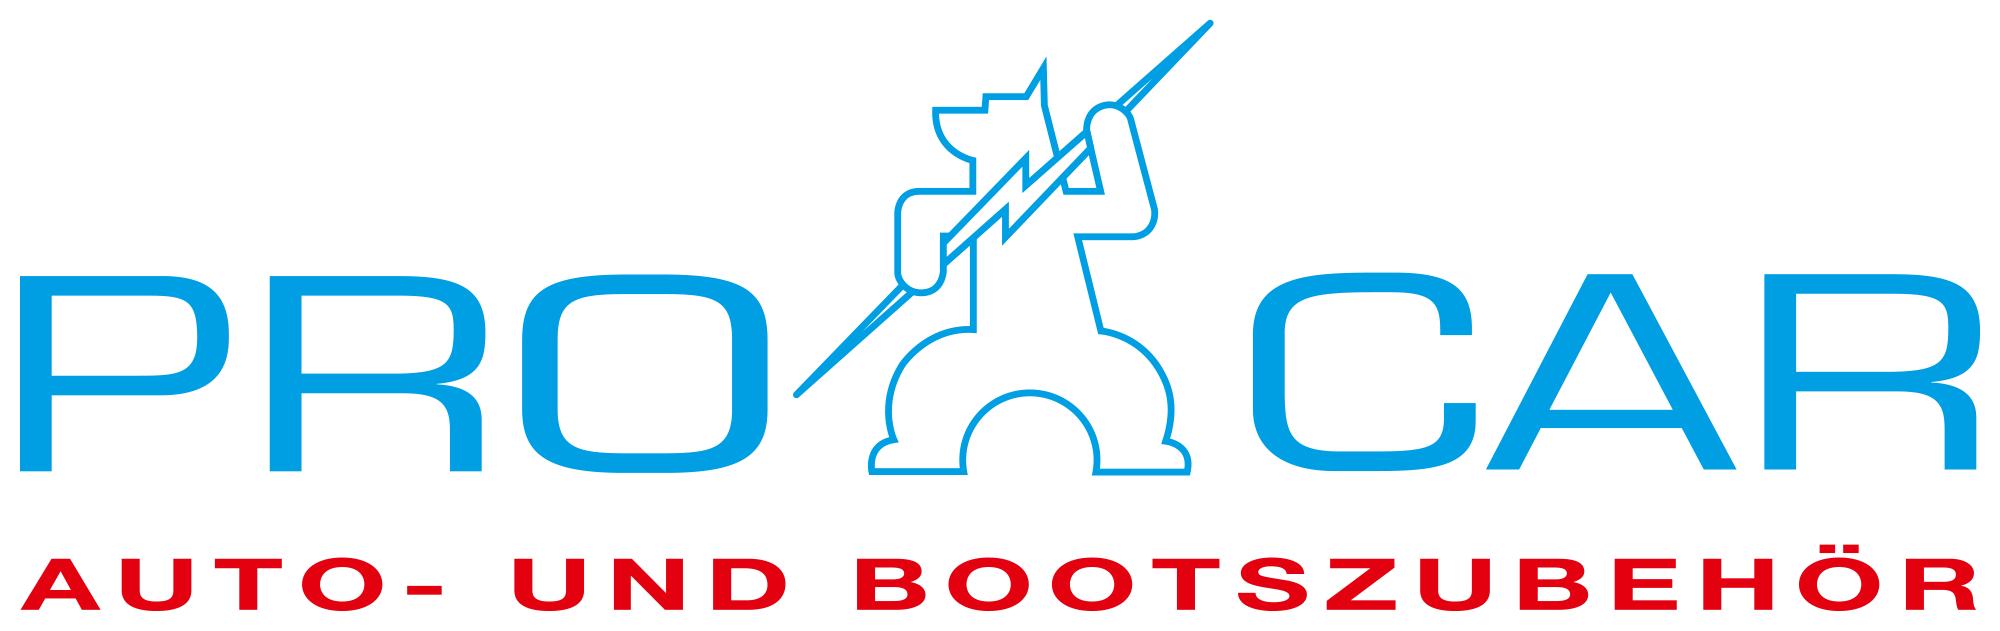 logo Pro car